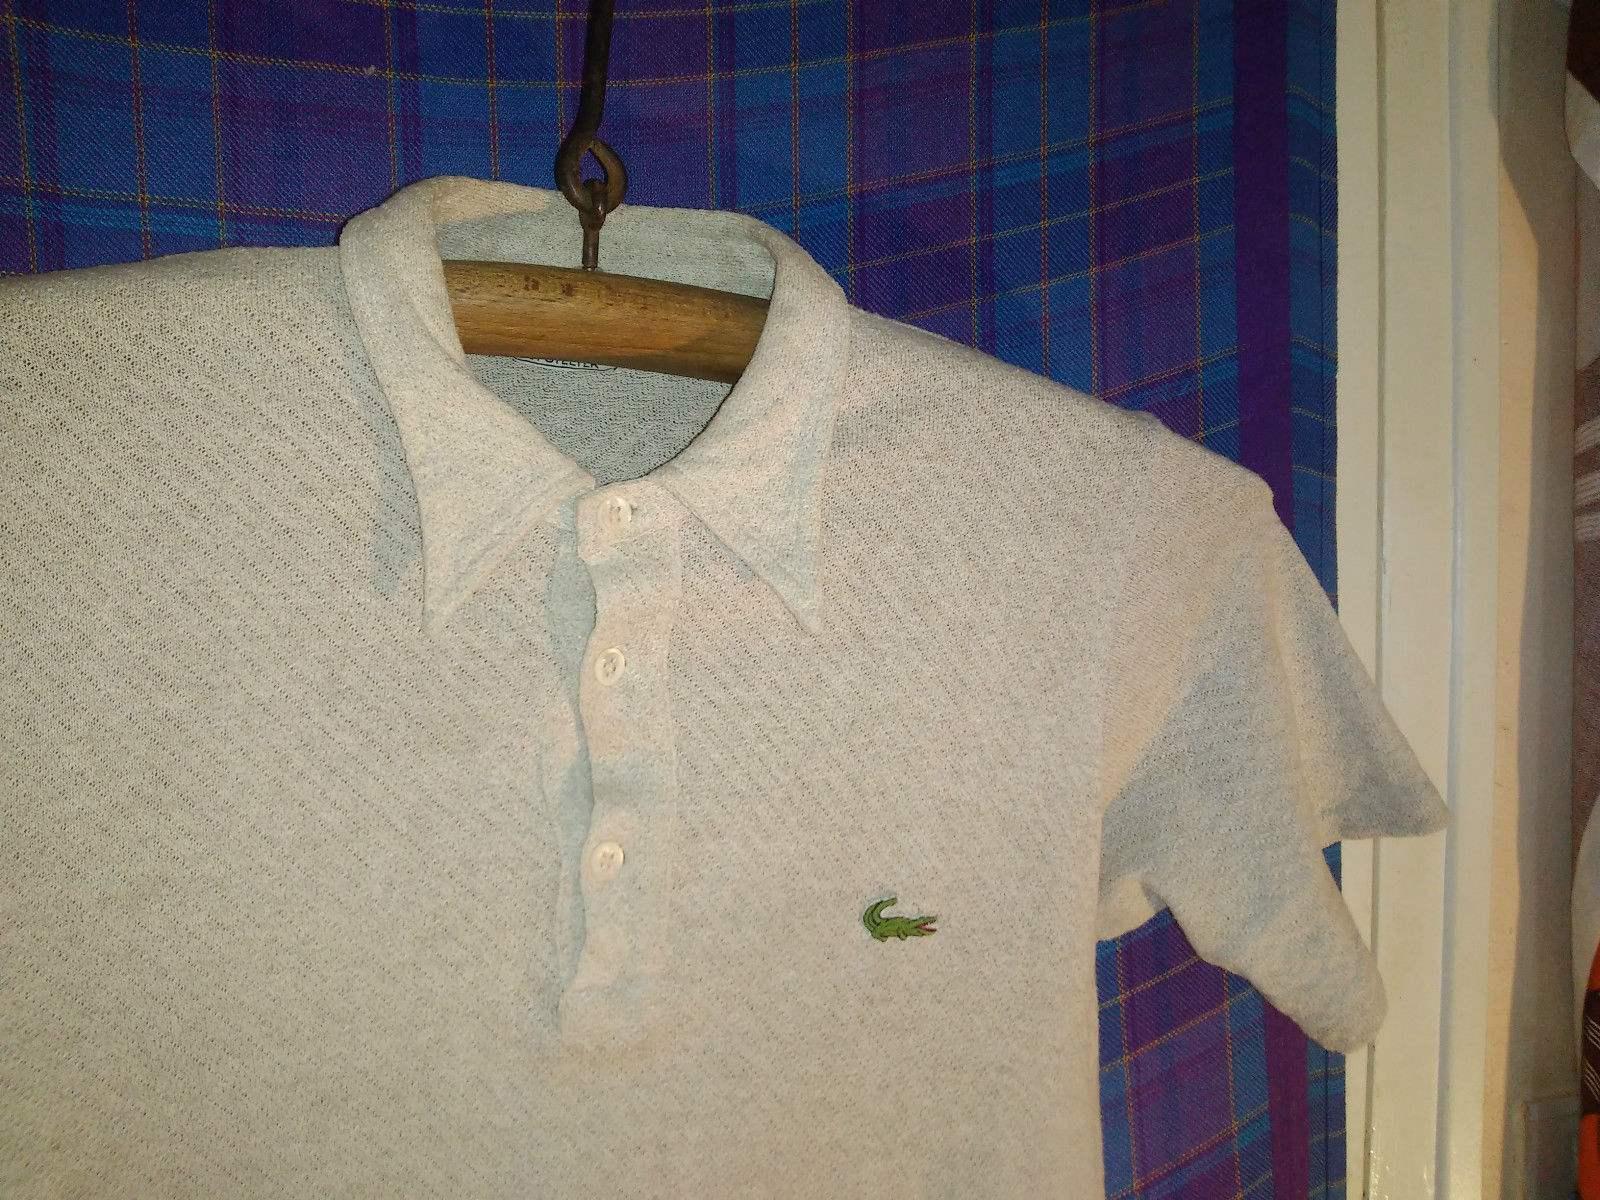 a9c22f051ba2 Authentic Lacoste Polo Shirt Vs Fake - BCD Tofu House